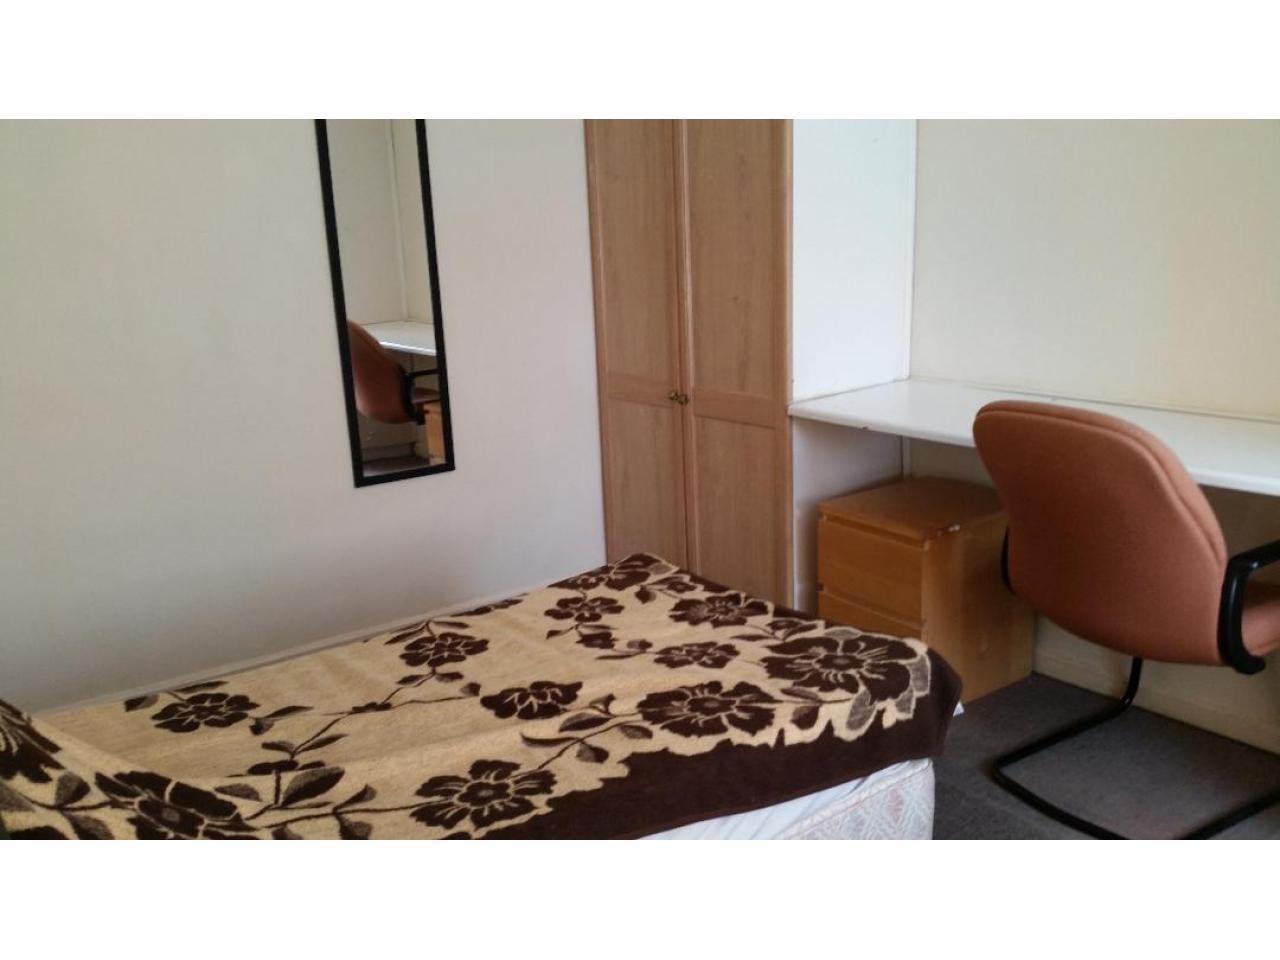 Double Room  Hounslow East £125 - 1